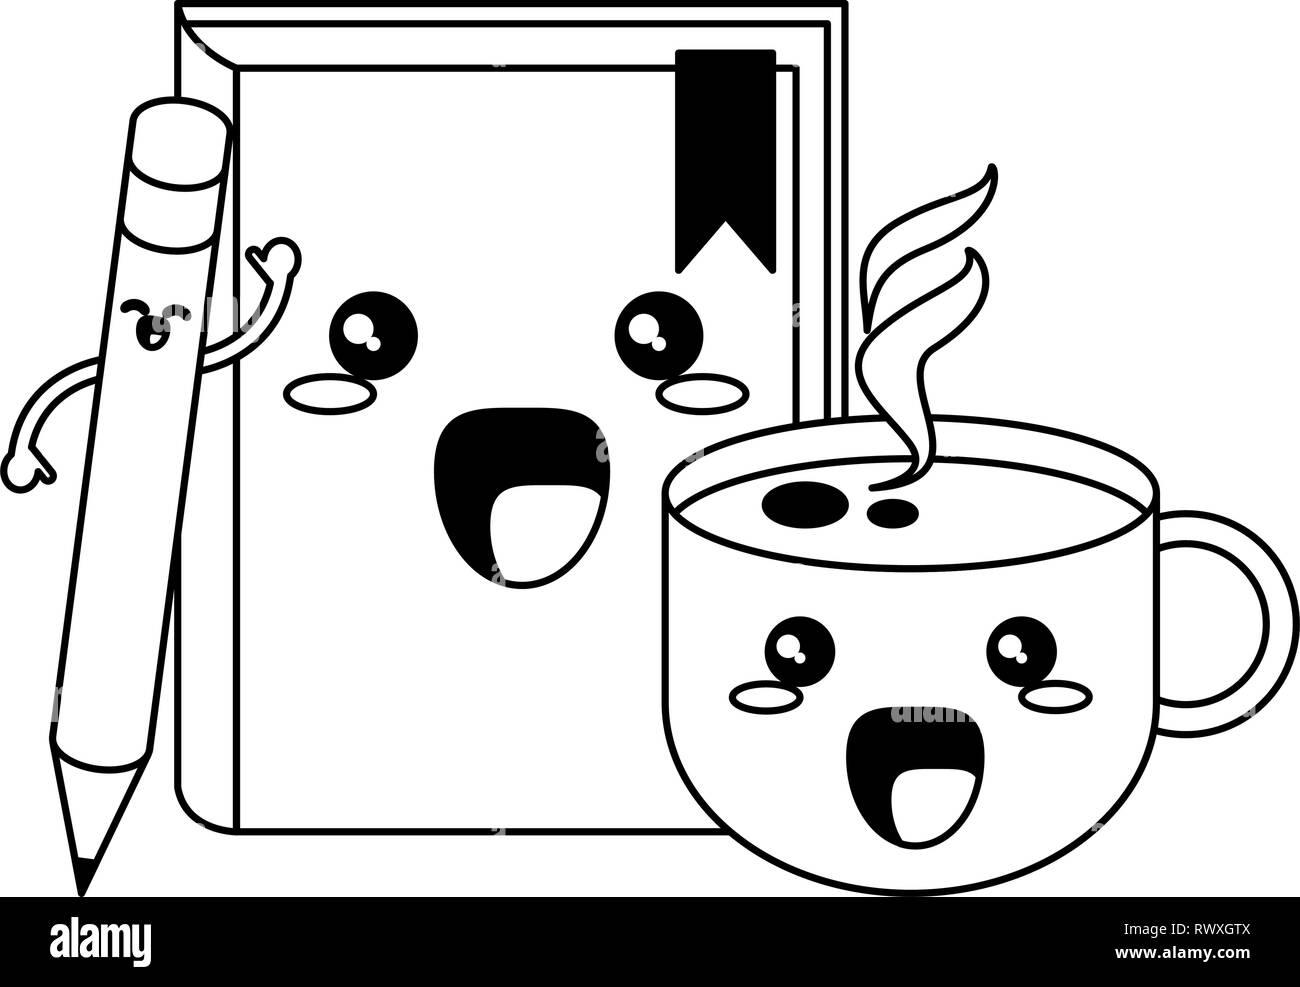 School Utensils Kawaii Cartoons In Black And White Stock